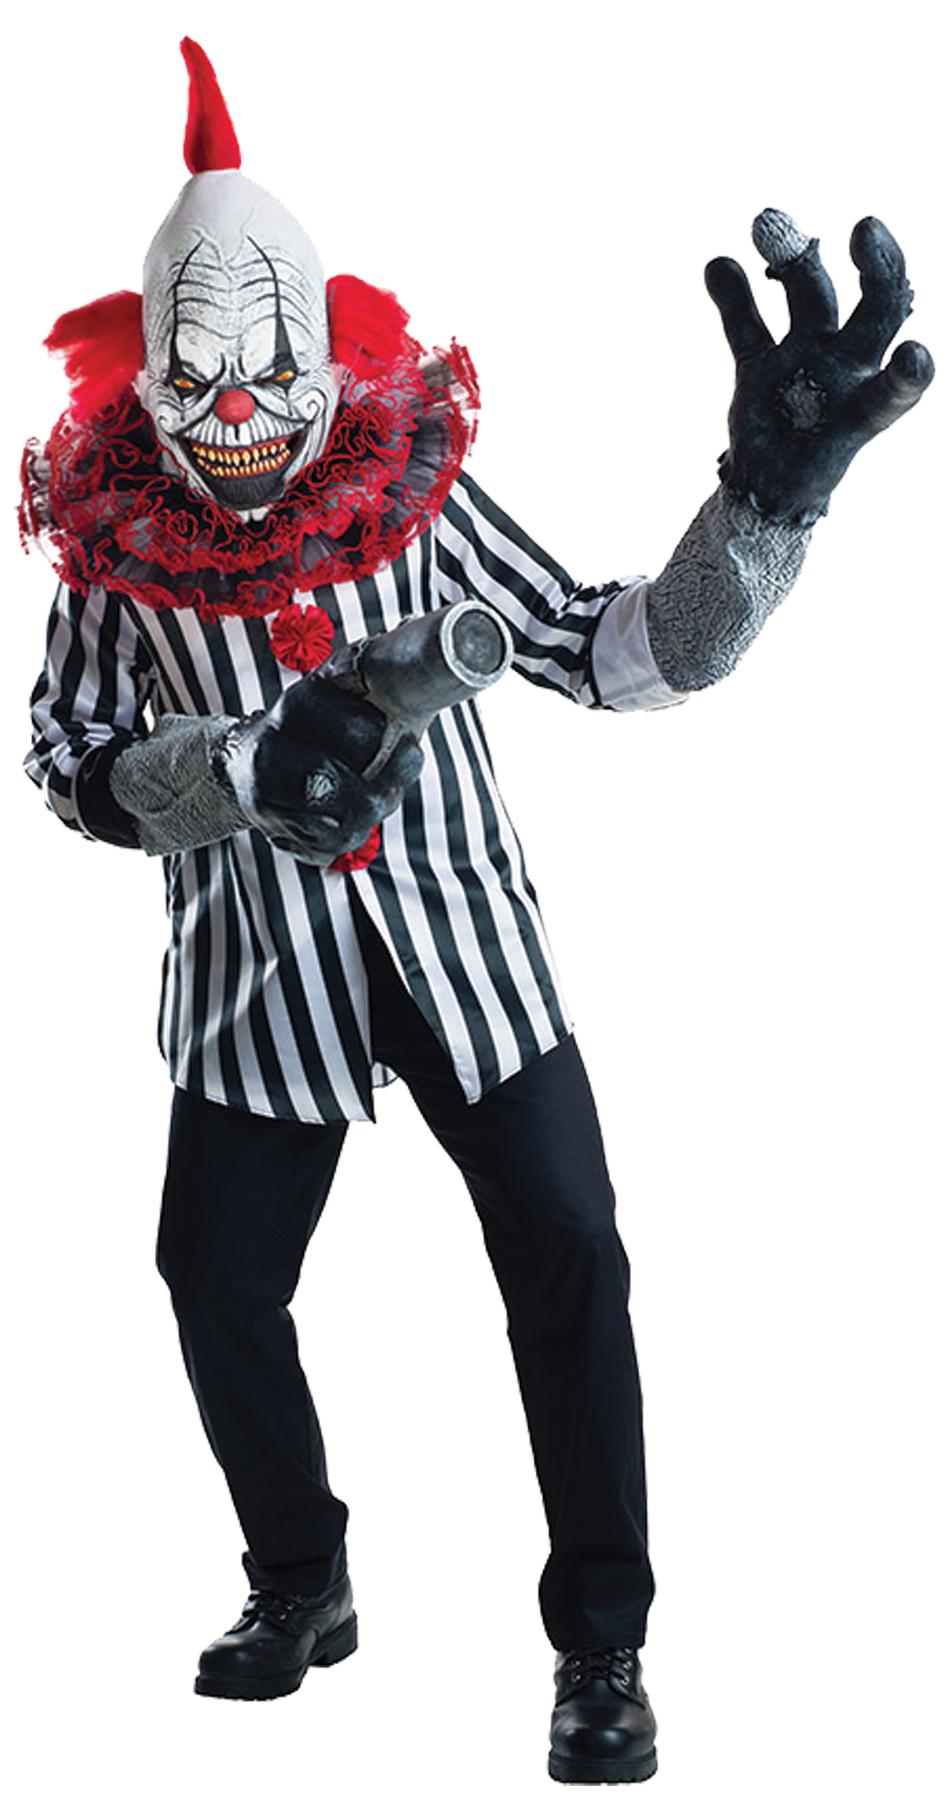 Creature Reacher Death Grin Costume